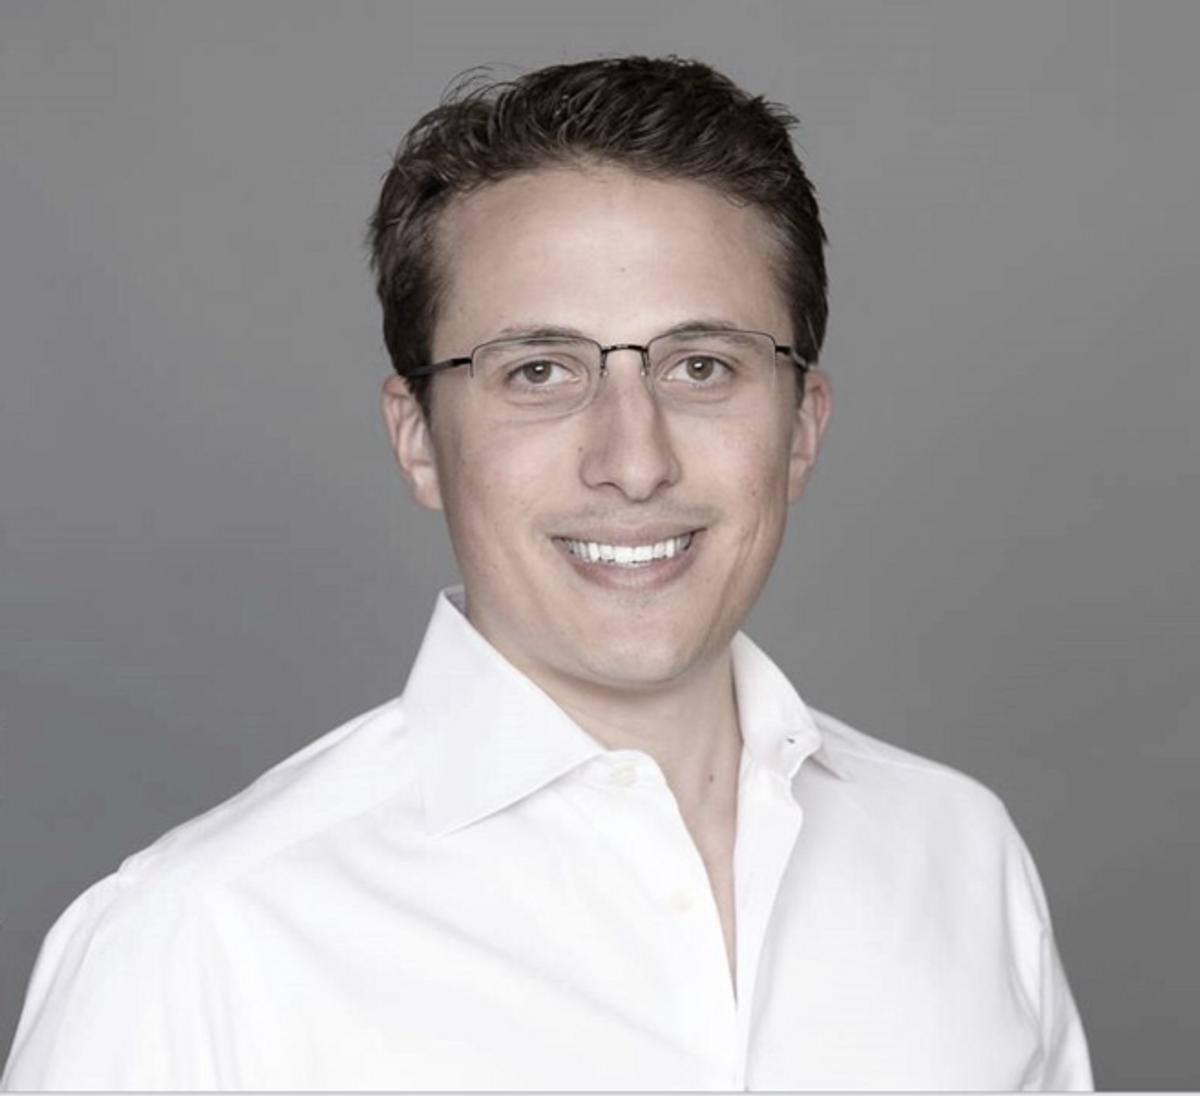 Photo of Alex Kahn, Managing Partner at Generation Ventures